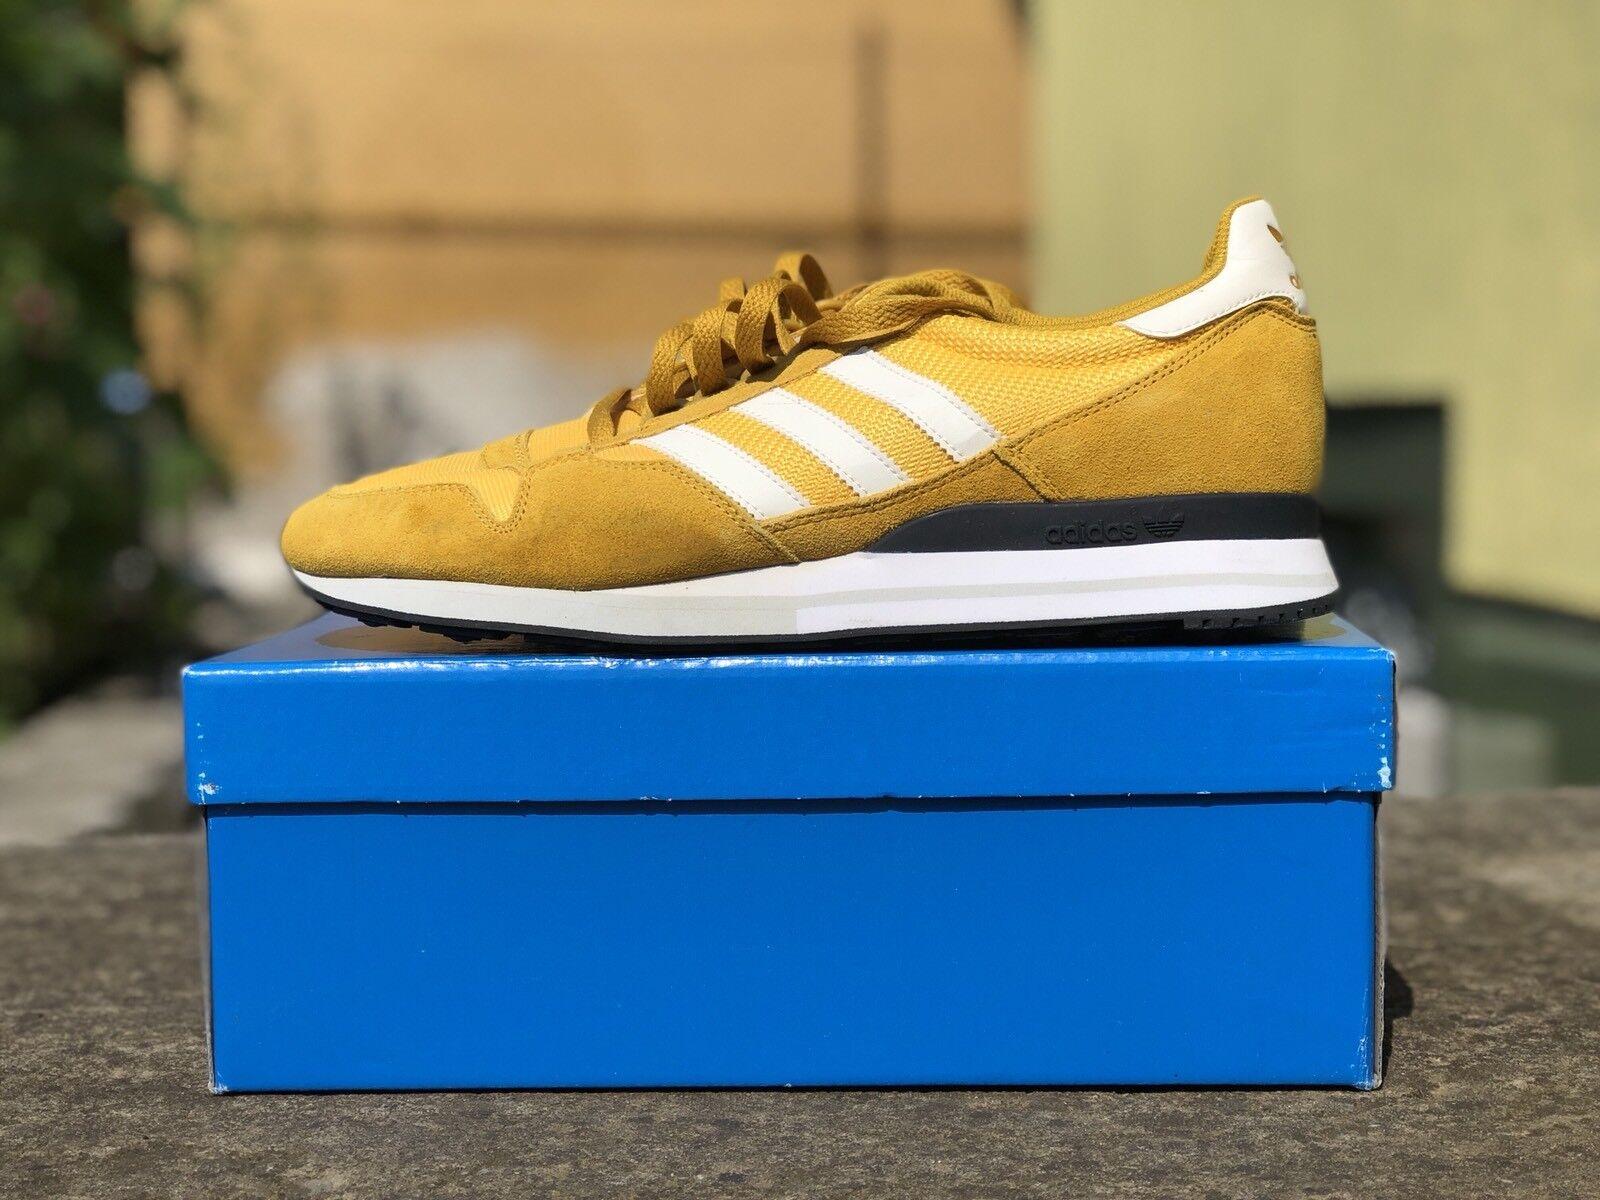 Billig Billig Billig gute Qualität Adidas ZX500 yellow EU45 1/3 cf96db